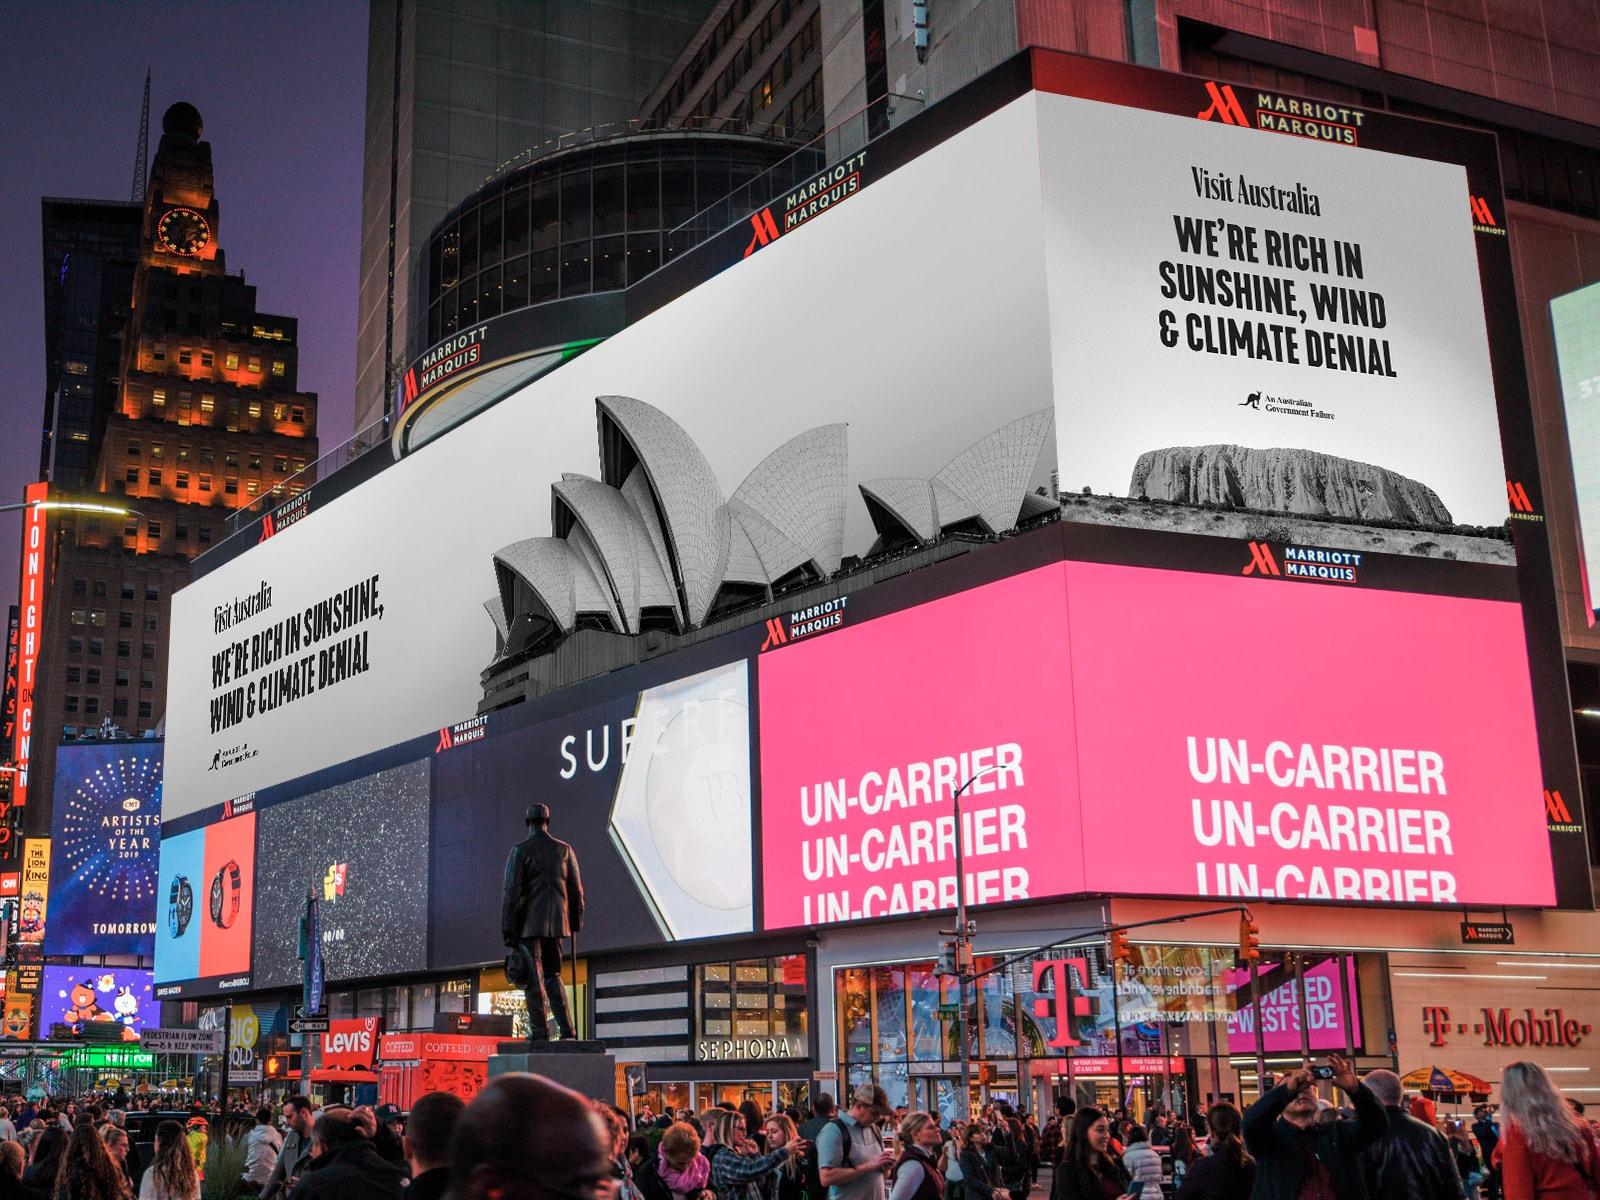 Visit Australia. Times Square, New York.